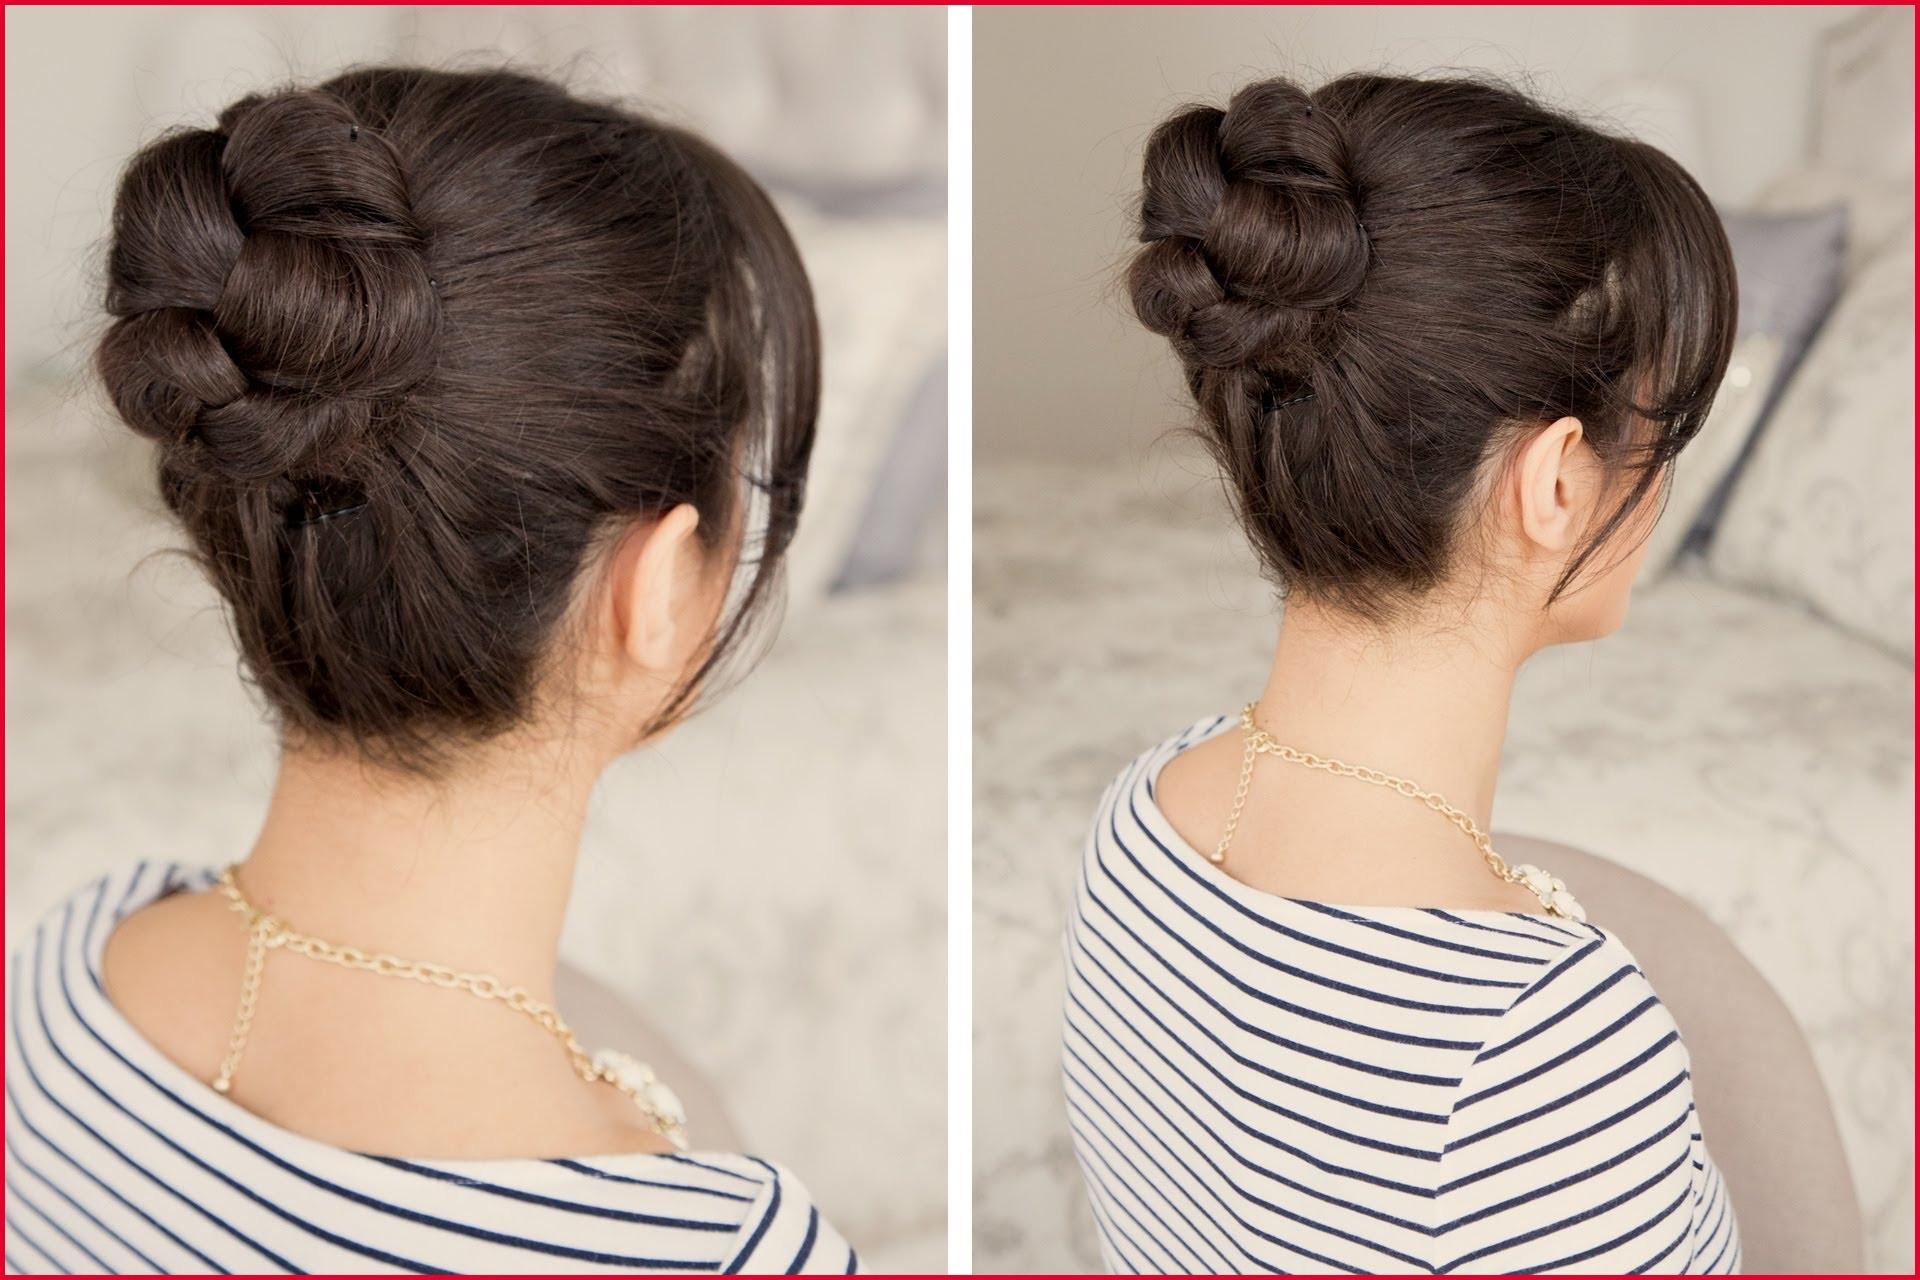 Braided Hairstyles In A Bun 235827 How To Braided Bun Hair Tutorial In Favorite Bun And Braid Hairstyles (View 11 of 15)